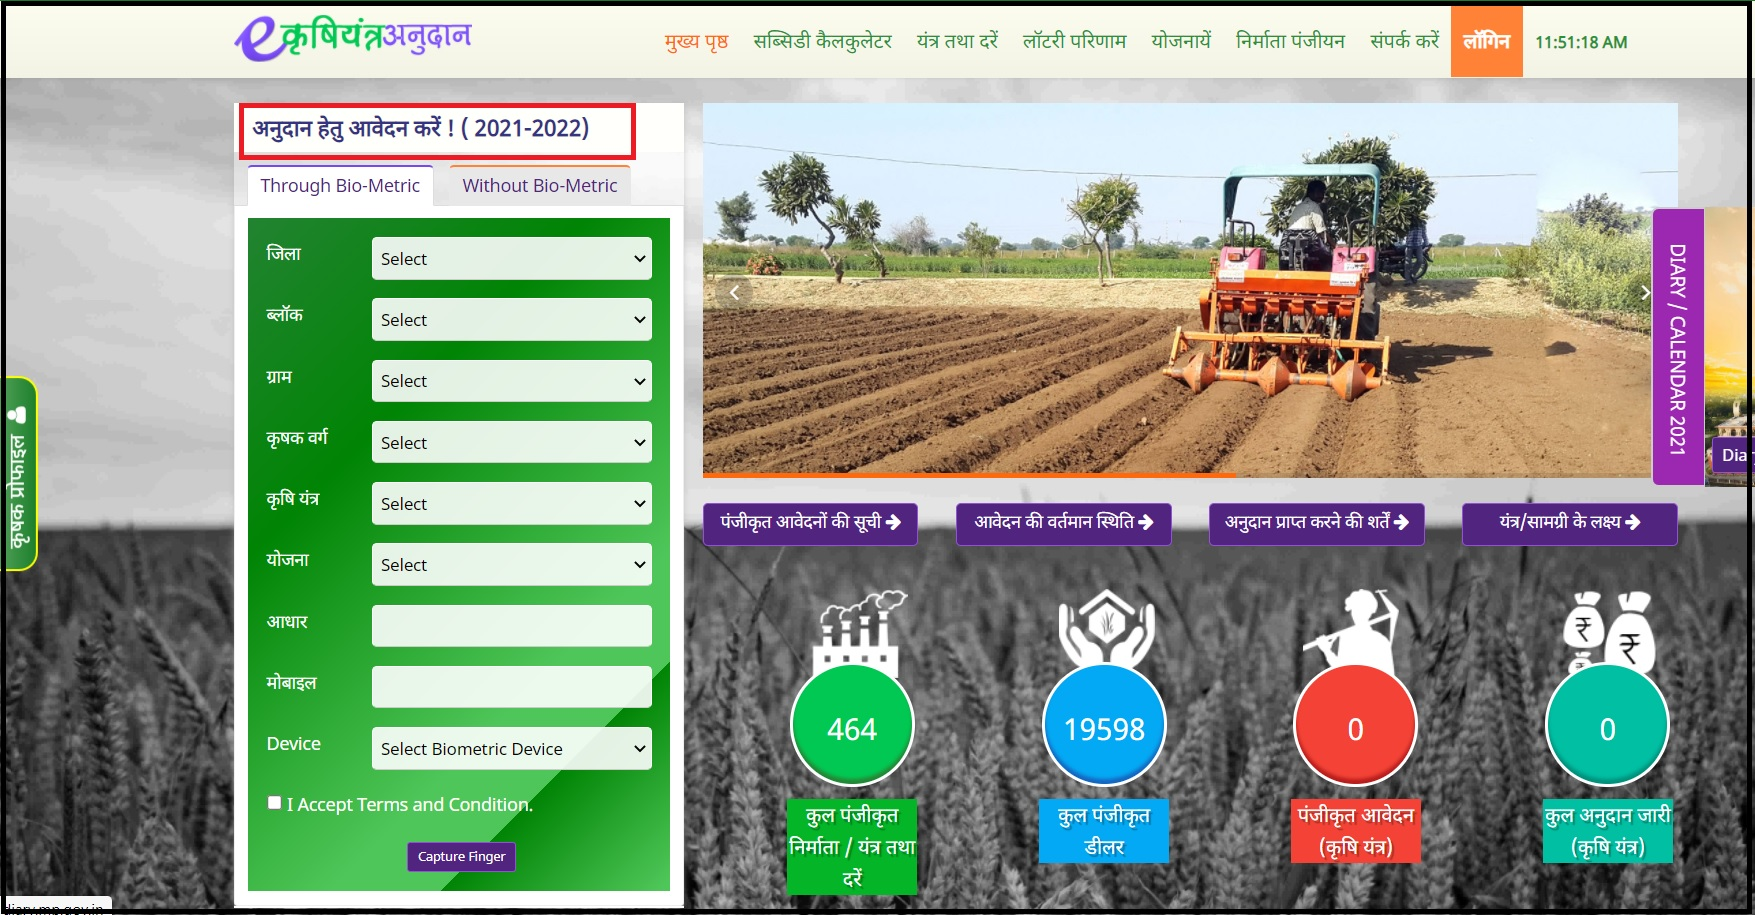 mp krishi anudan yojana online form